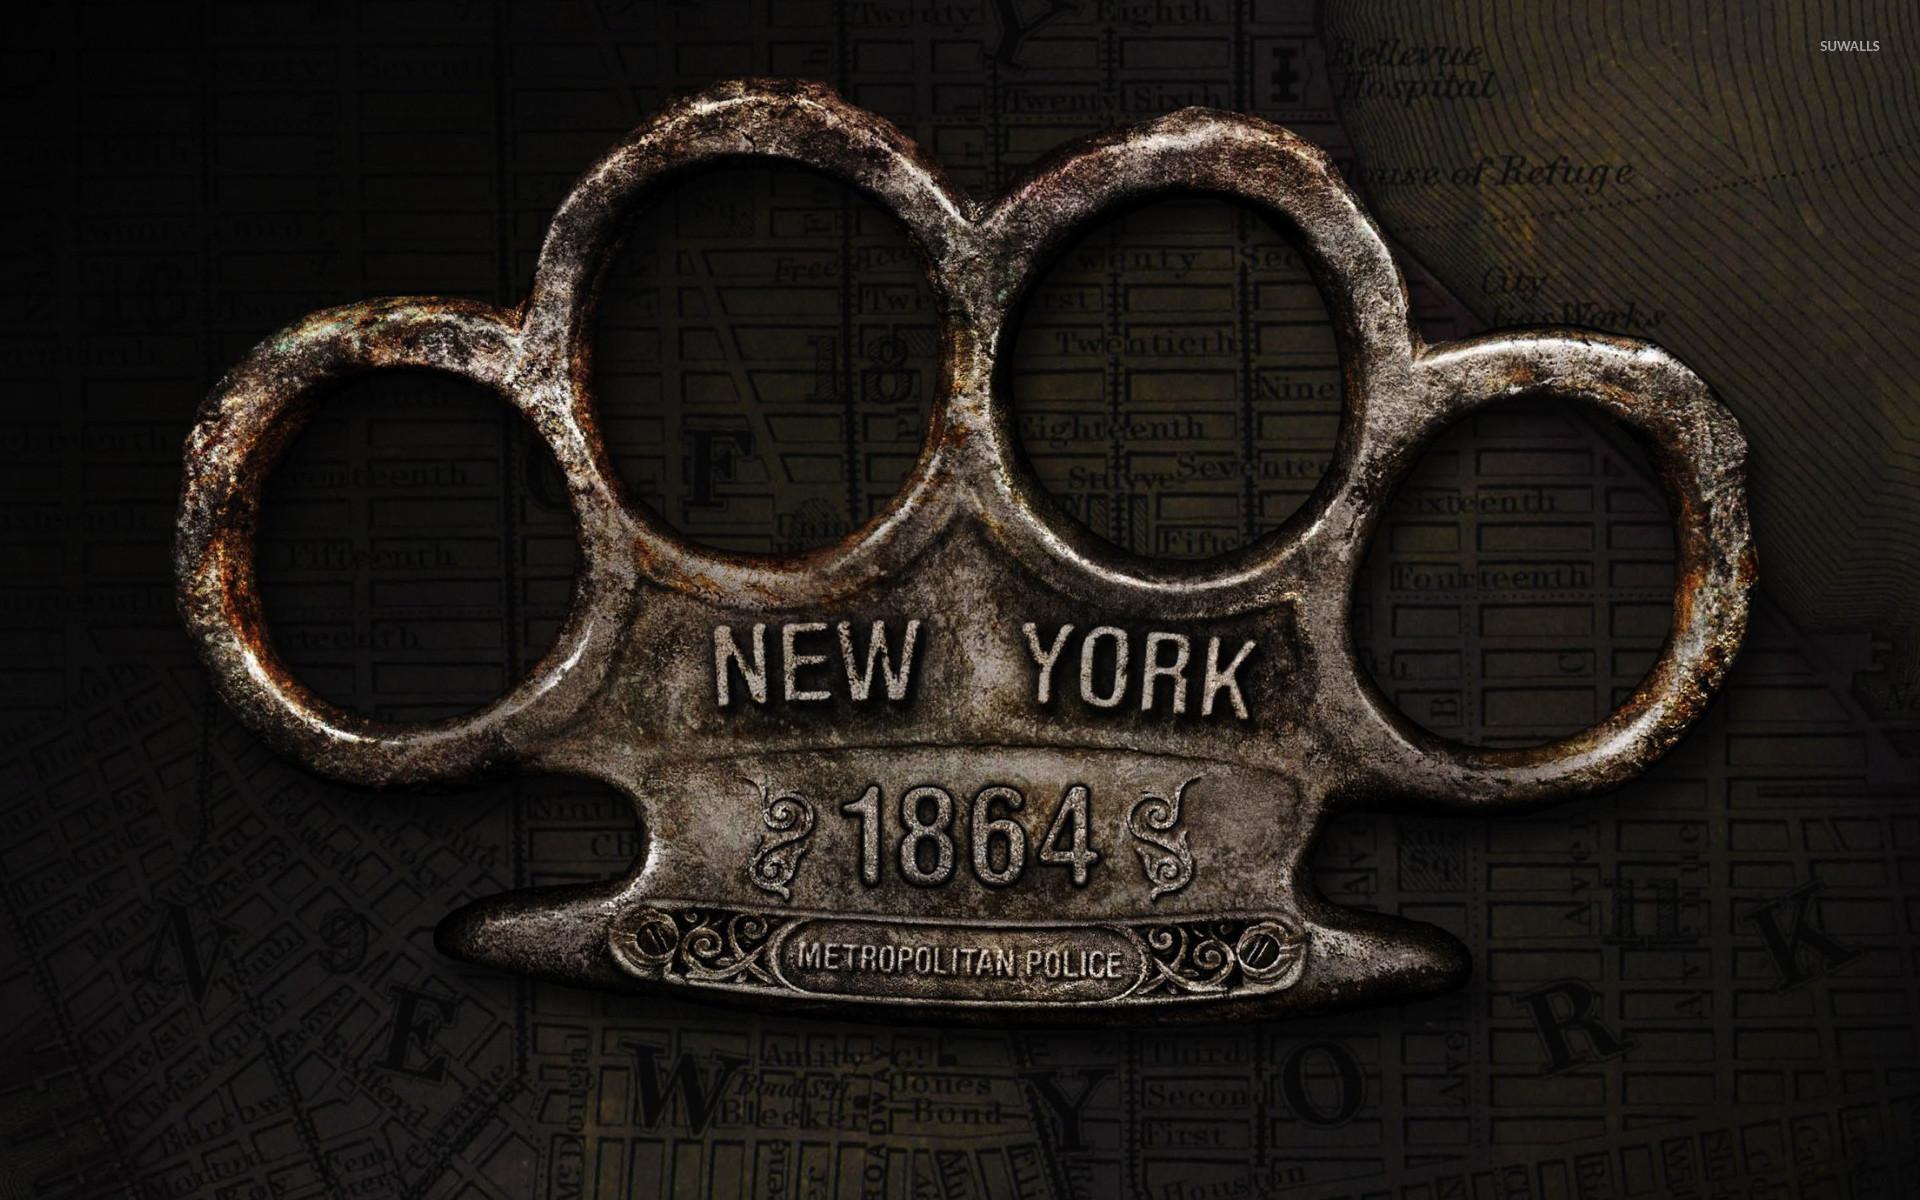 Brass knuckles New York metropolitan police wallpaper